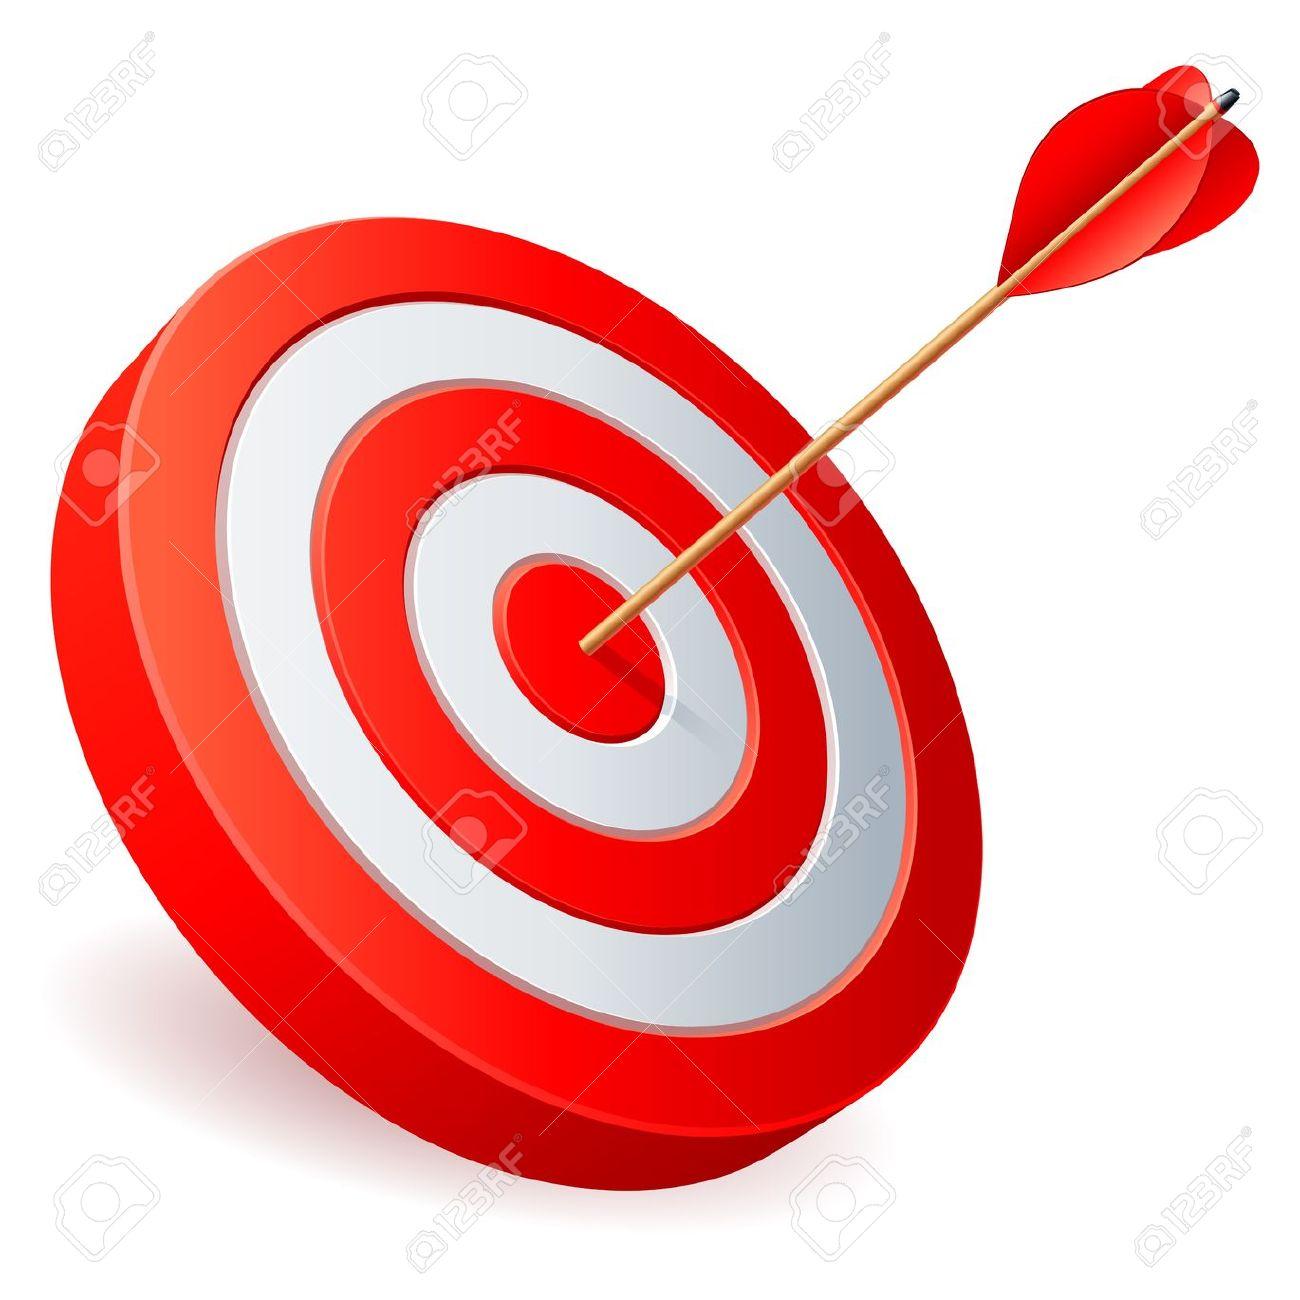 Arrow and target clipart image stock Arrow hitting target clipart - ClipartFest image stock